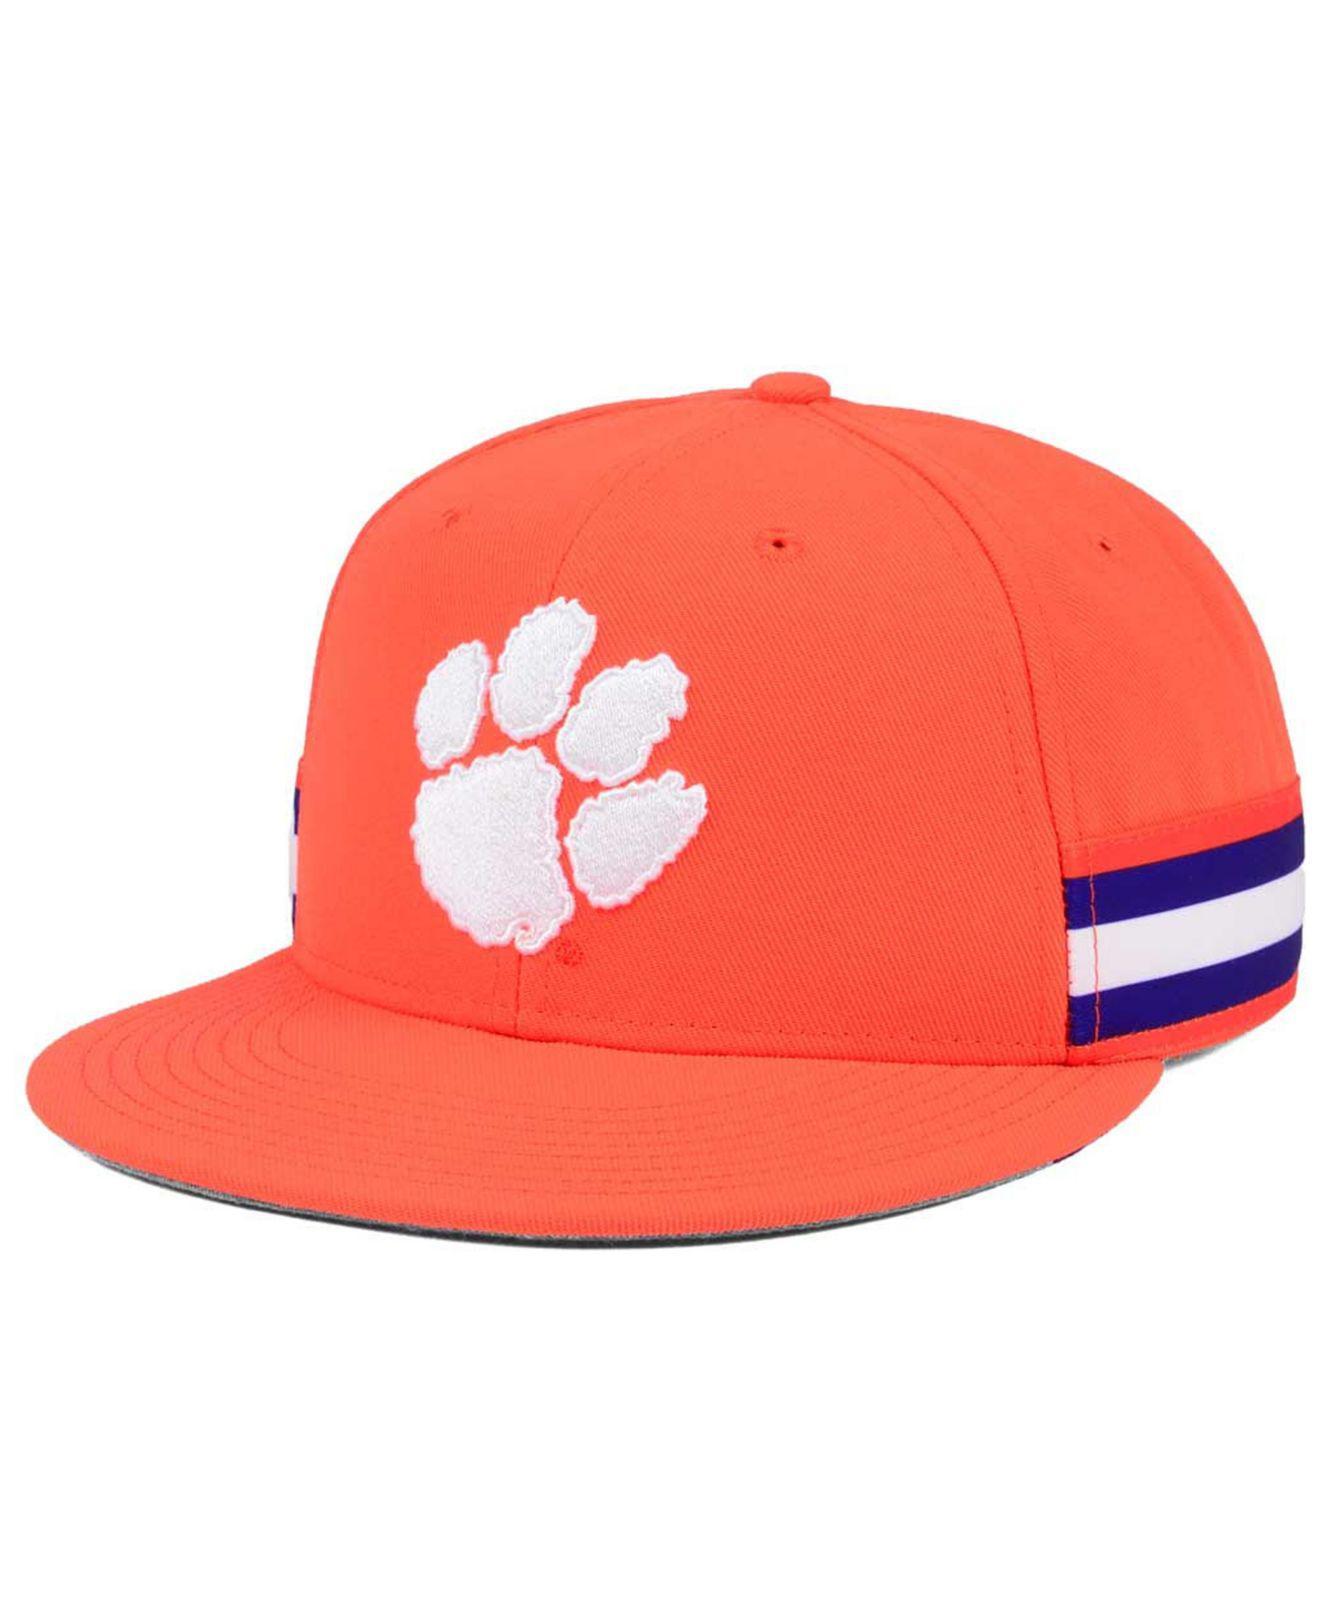 promo code cfc58 0de1f Nike Clemson Tigers True Woven Stripe Snapback Cap in Orange for Men ...